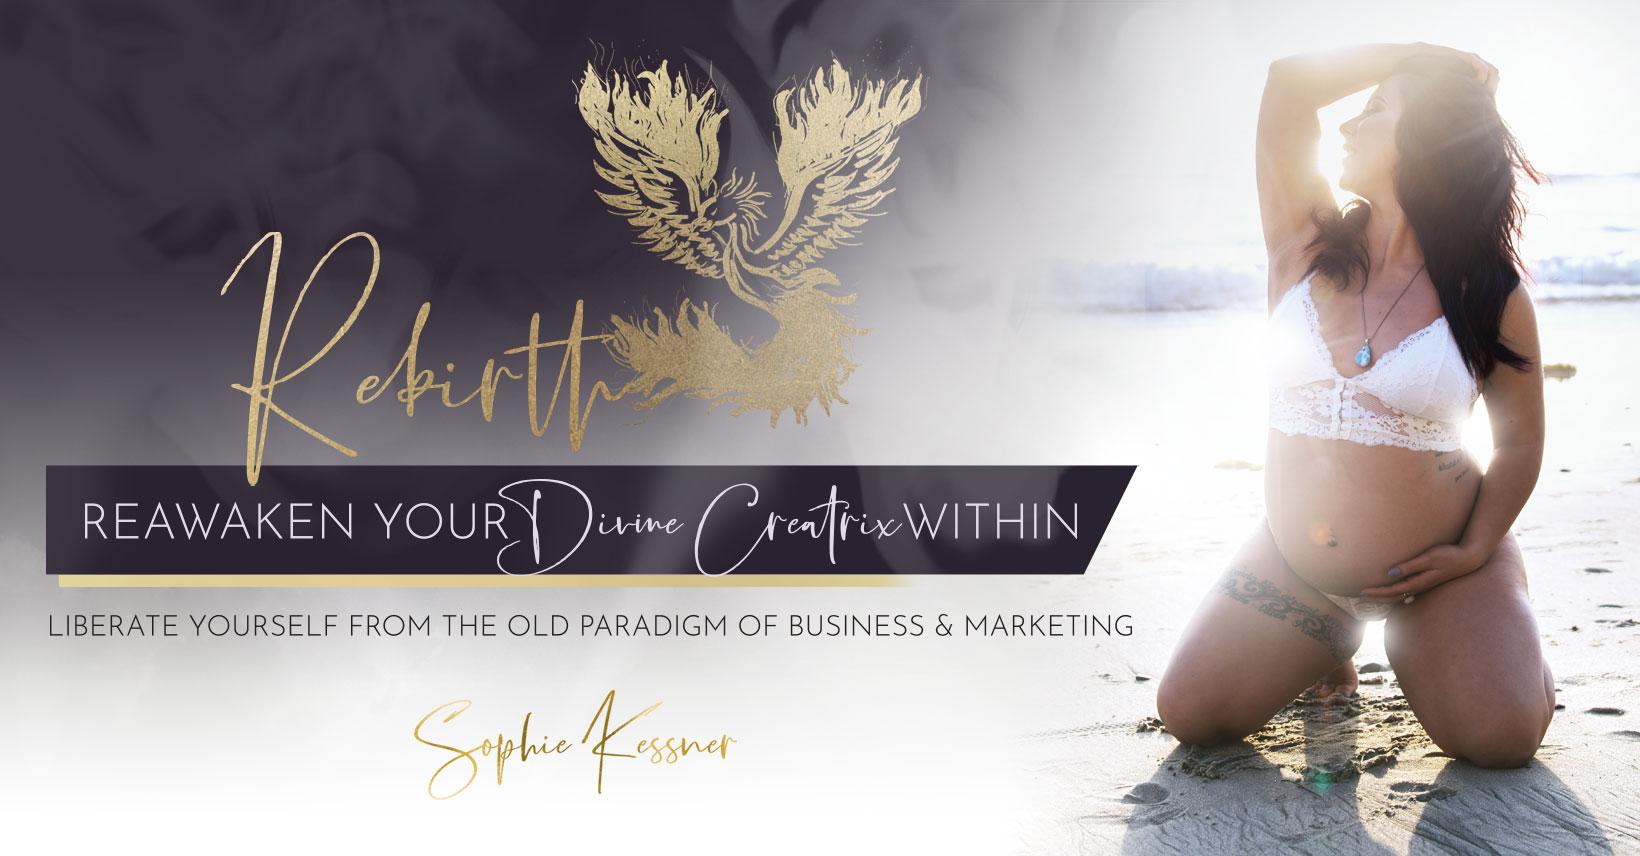 REBIRTH-Soph-Kessner-Group-Fbook-Banner-April-2020